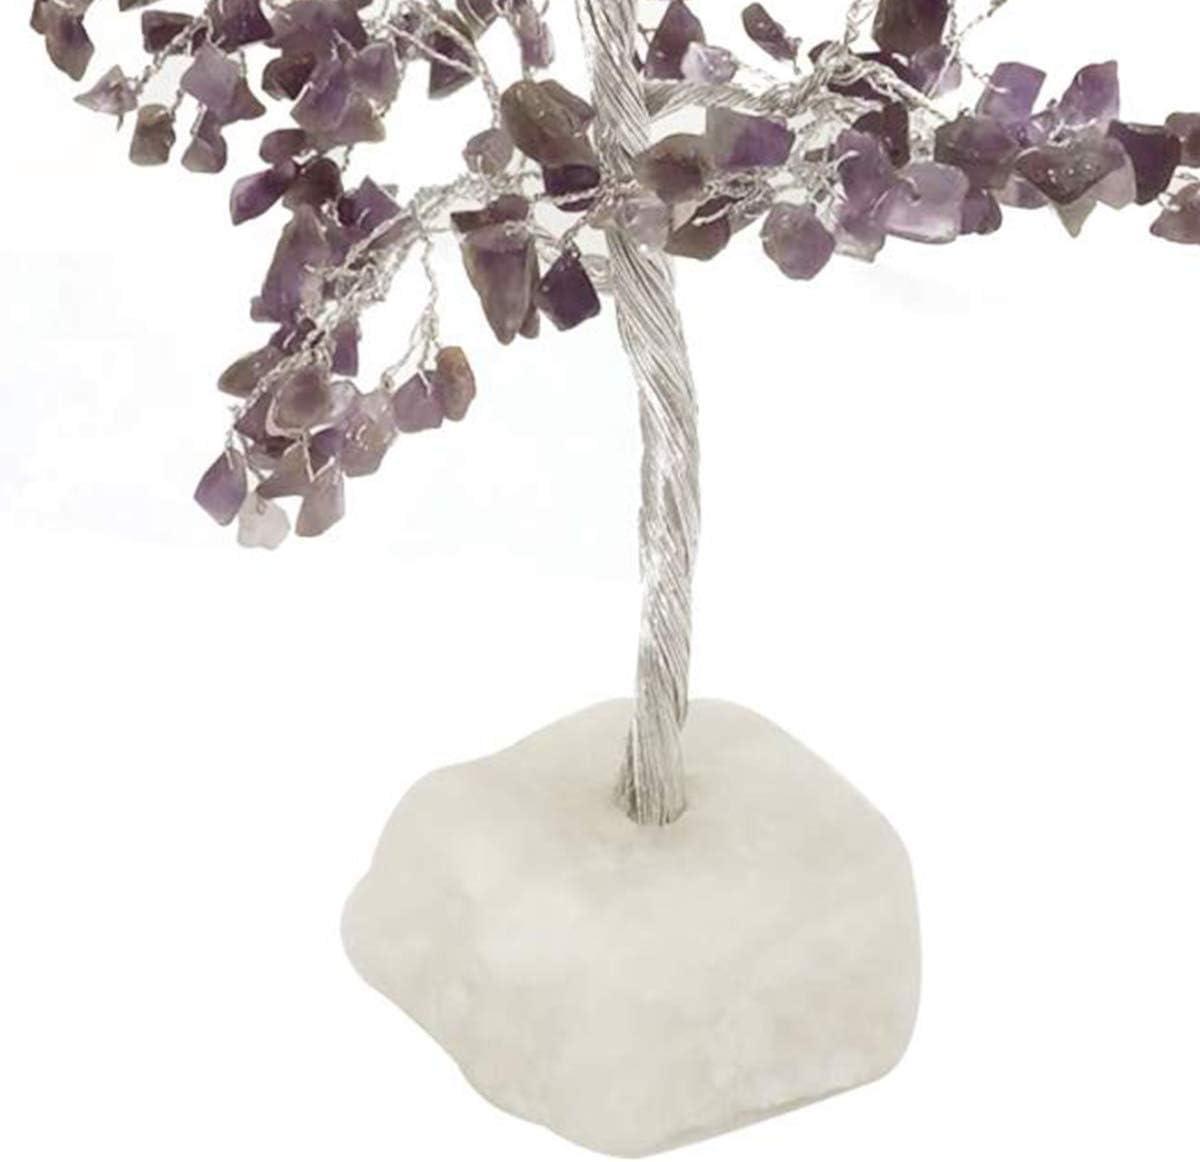 Crocon Amethyst Quartz Base Gemstone Money Tree Feng Shui Bonsai for Reiki Healing Chakra Stone Balancing Energy Generator Spiritual Meditation Home Interior Office Decor Size 10-12 Inch